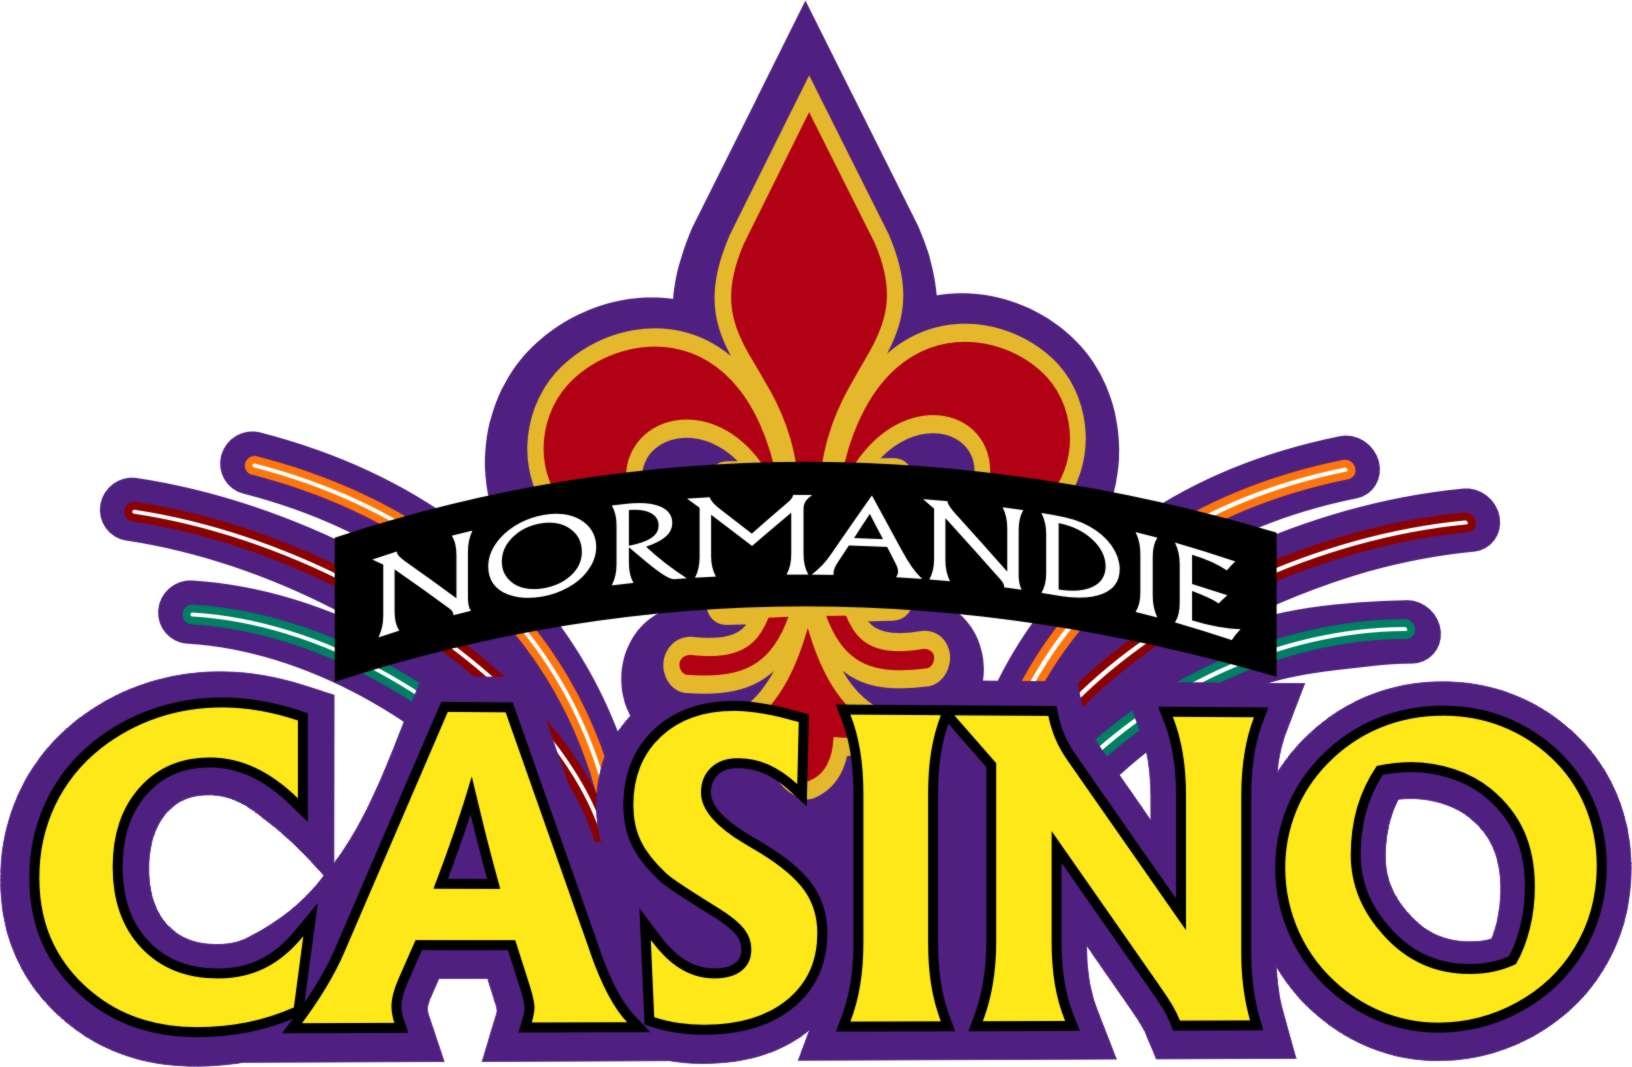 Normandie Casino card club money laundering